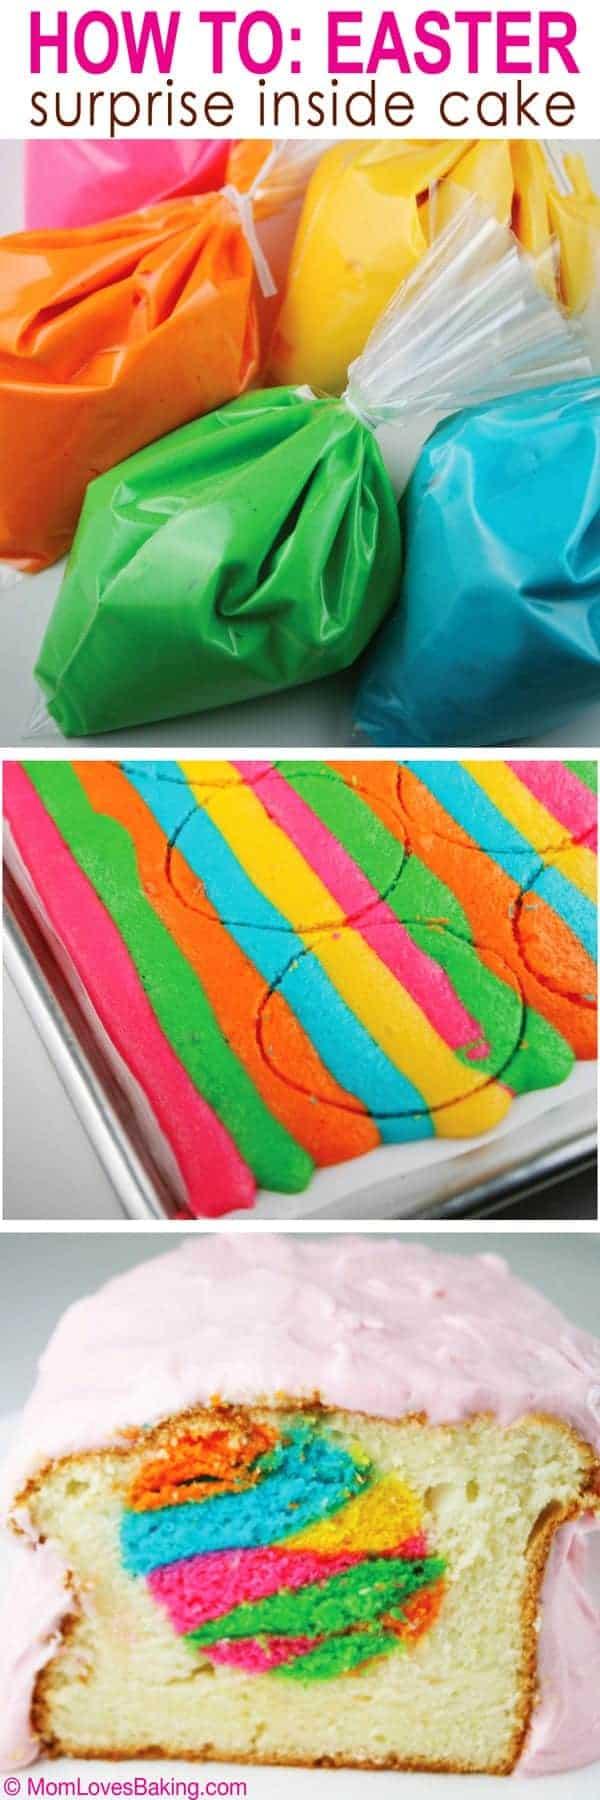 Easter-Surprise-Inside-Cake